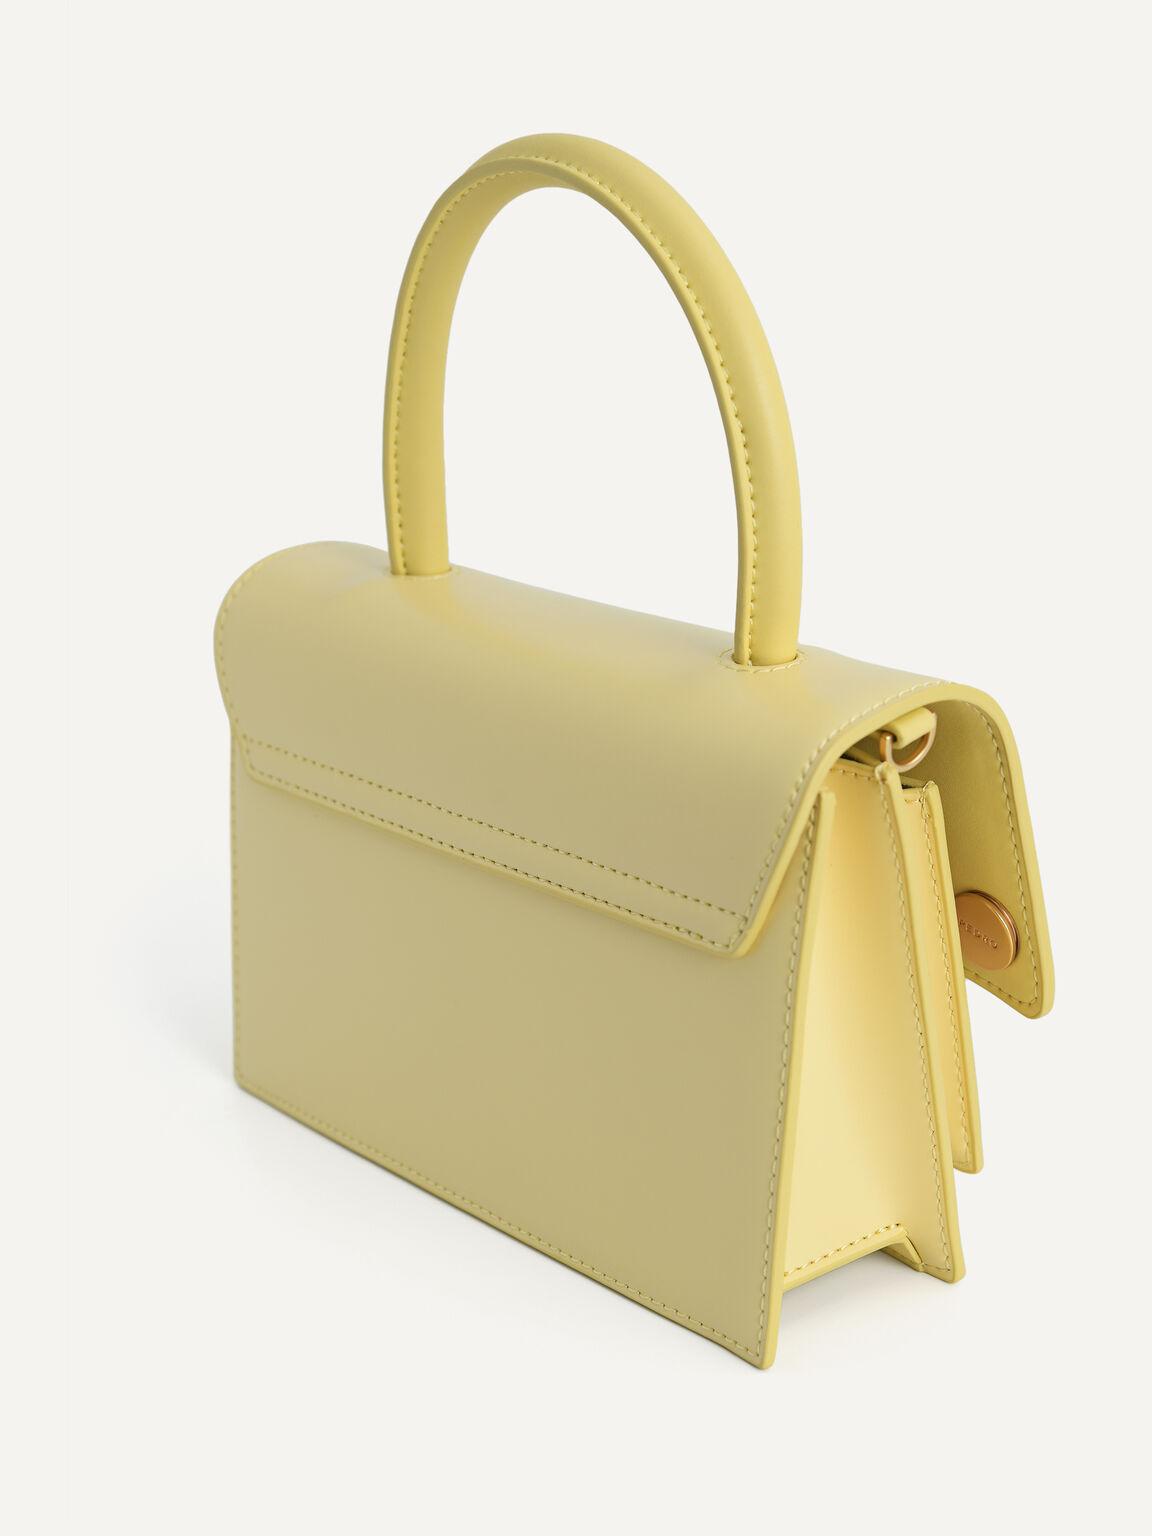 Boxy Leather Top Handle Bag, Light Yellow, hi-res